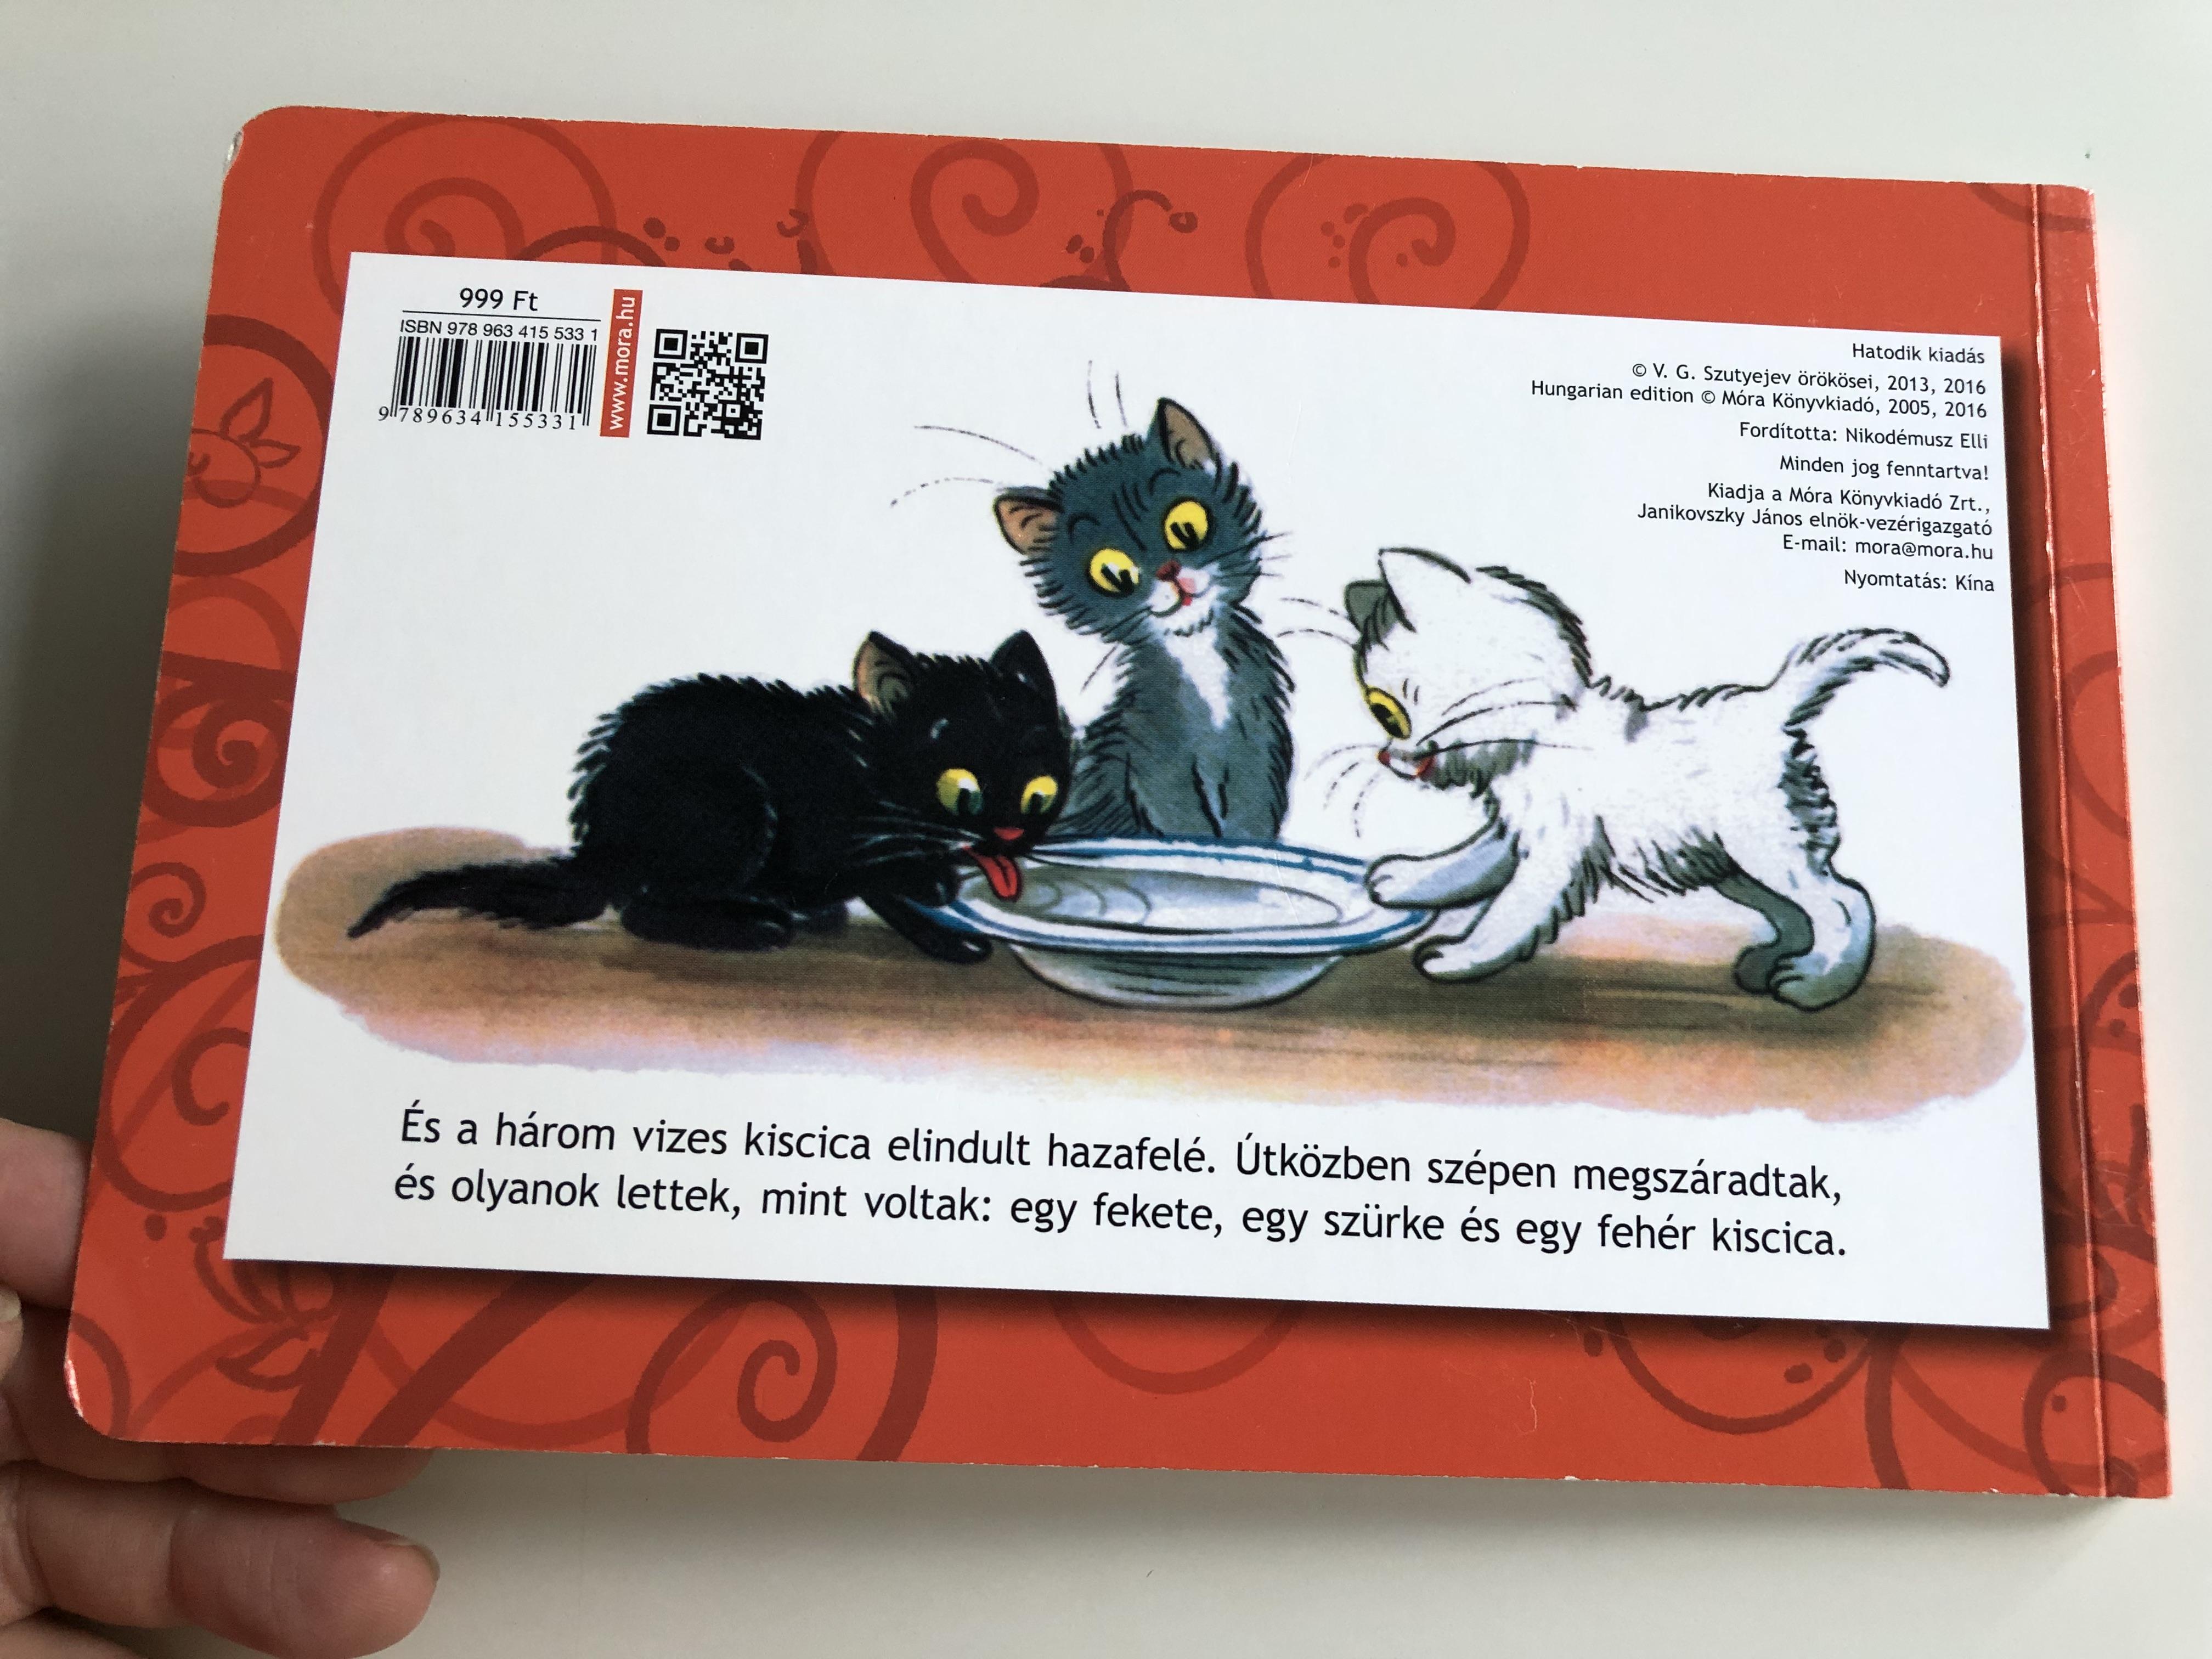 a-h-rom-kiscica-by-vlagyimir-szutyejev-hungarian-language-board-book-about-three-cats-m-ra-k-nyvkiad-2016-9-.jpg